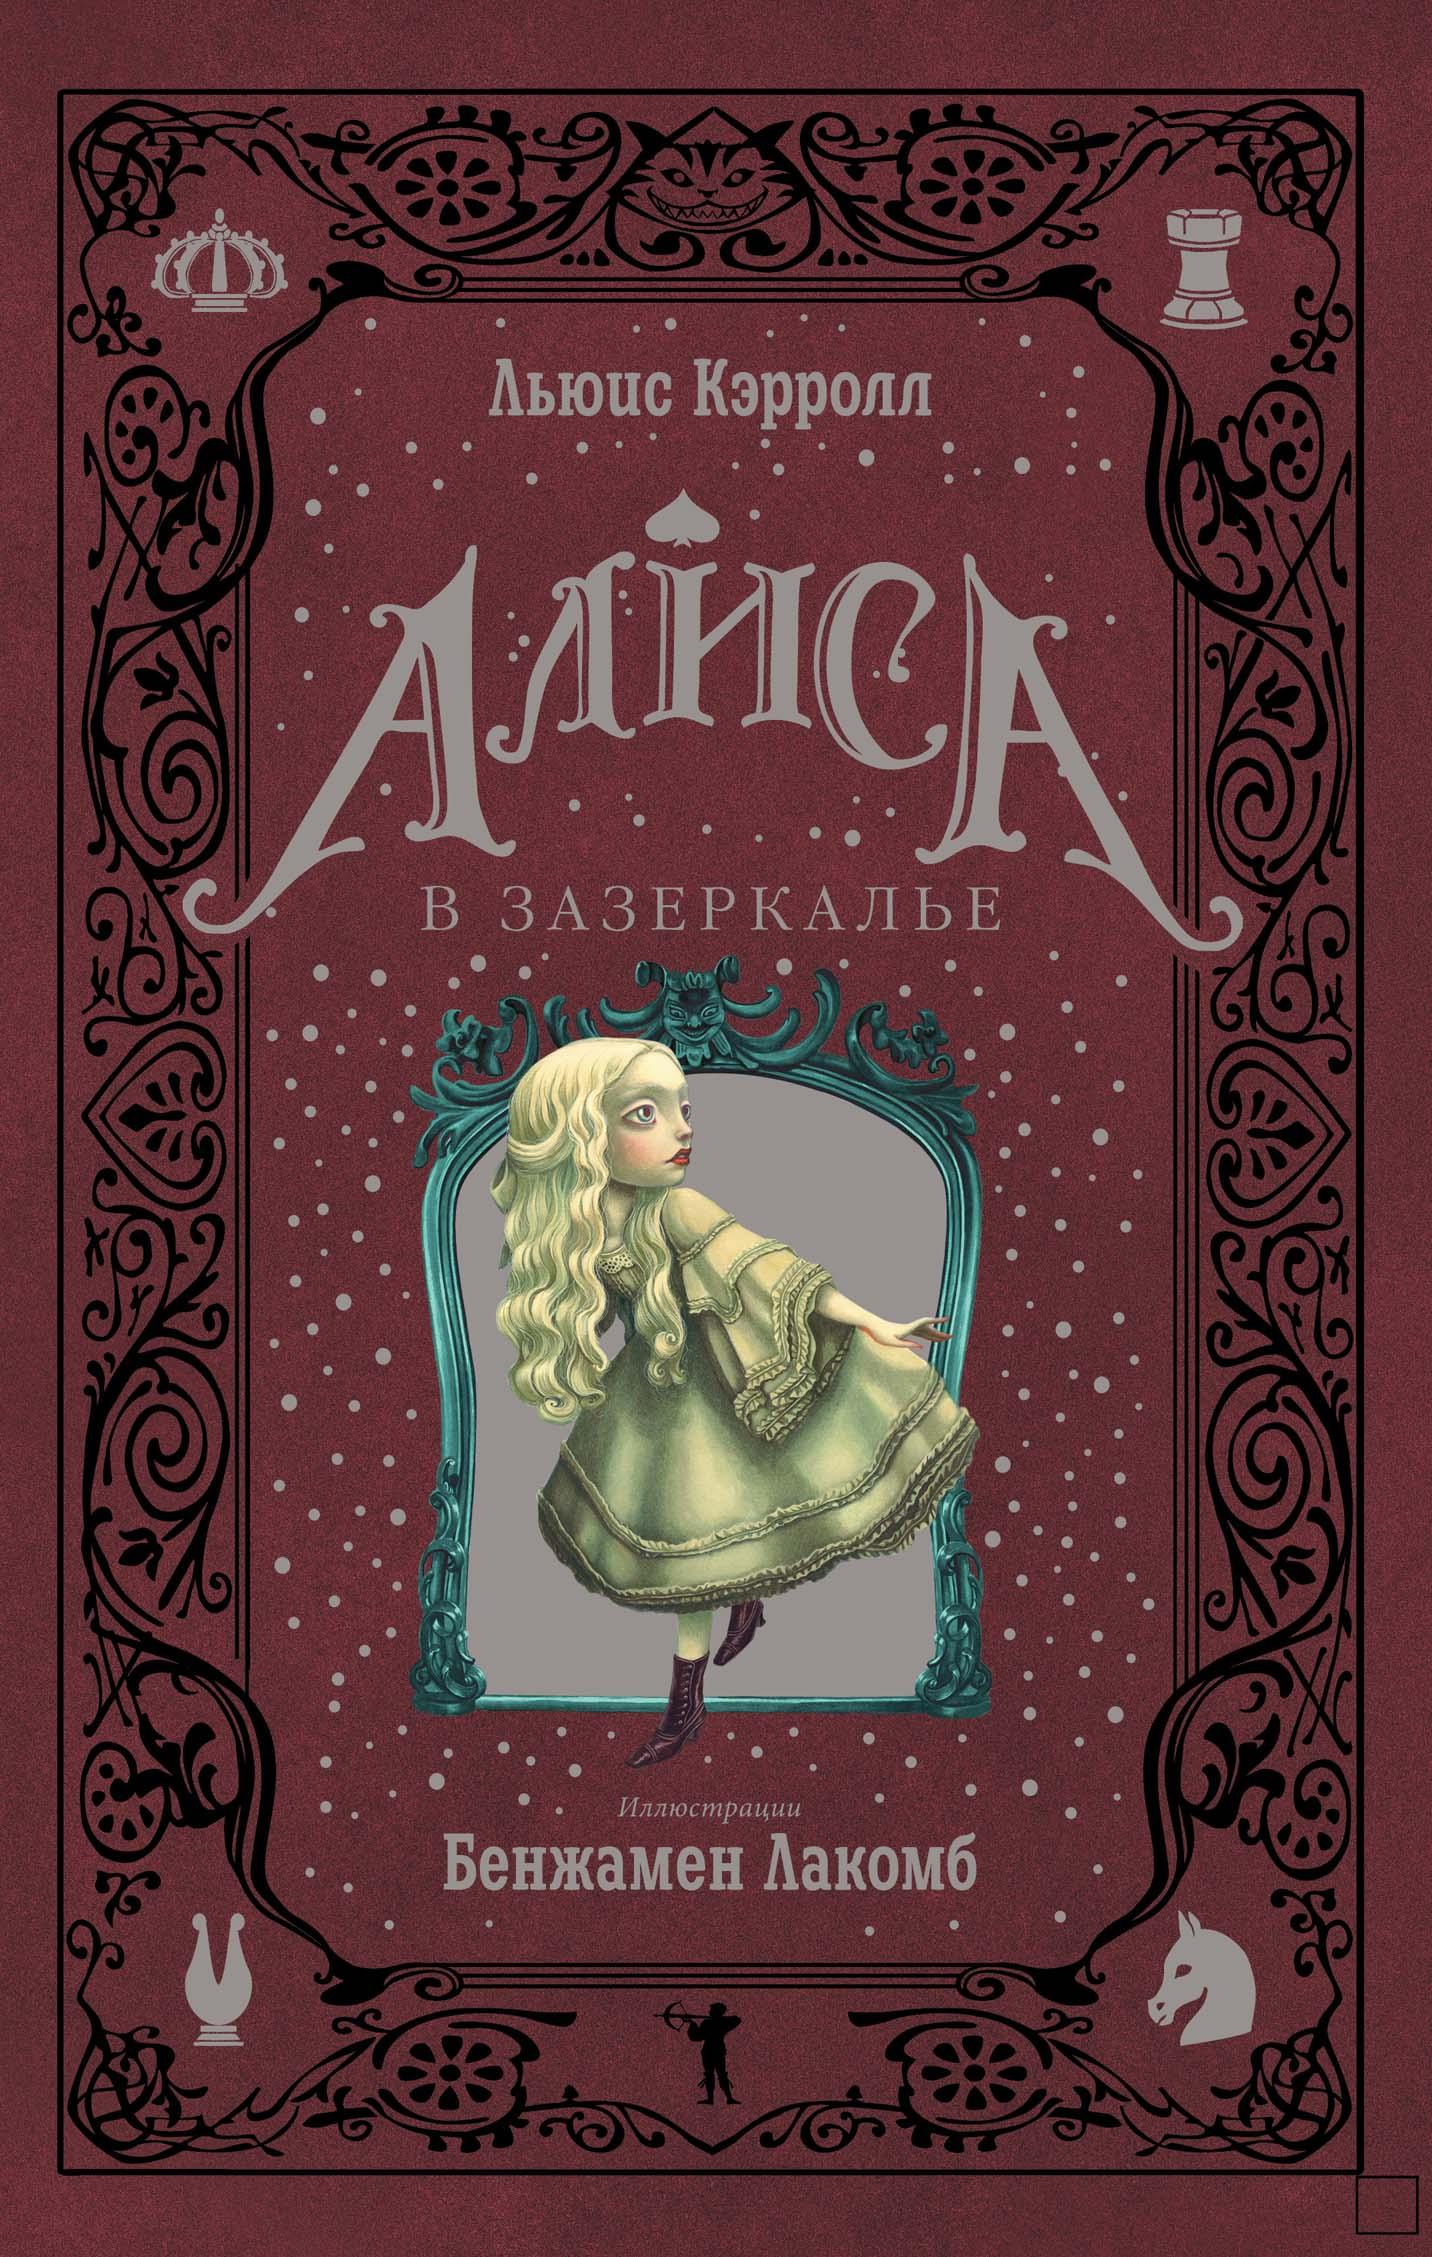 Льюис Кэрролл Алиса в Зазеркалье алиса в стране чудес алиса в зазеркалье охота на снарка сильвия и бруно пища для ума азбука